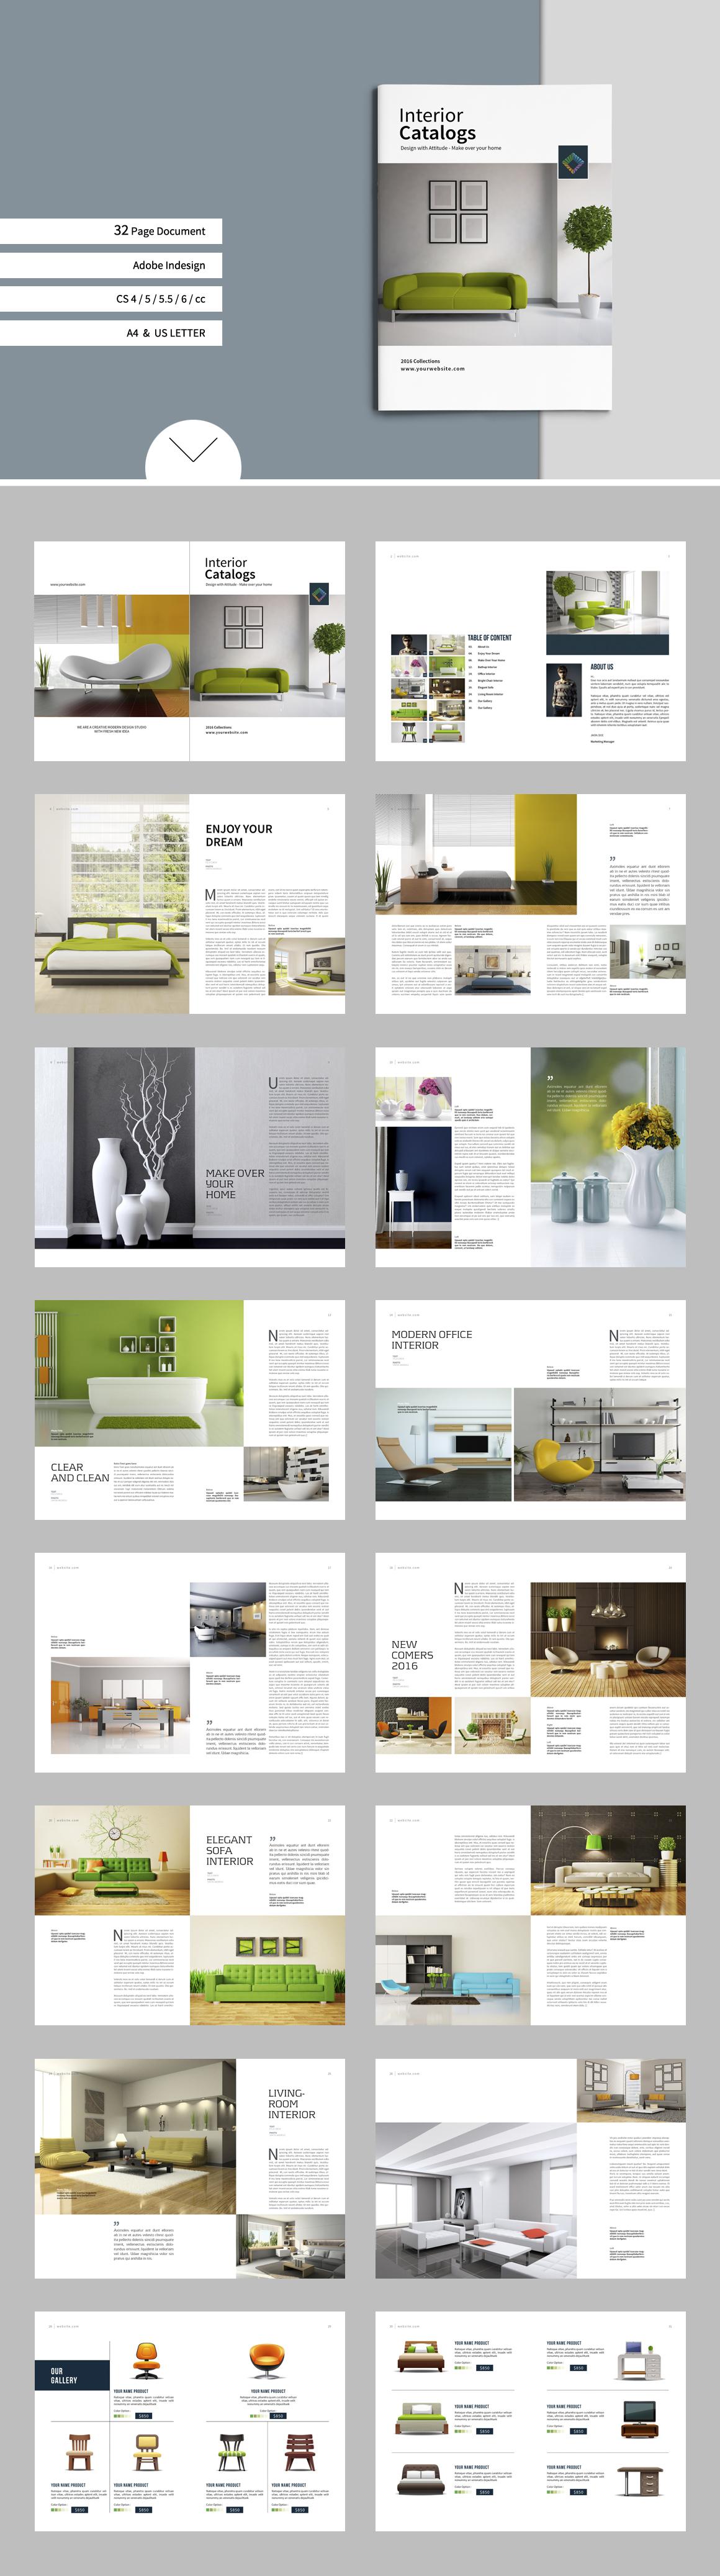 Interior Catalogs by tujuhbenua on creativemarket